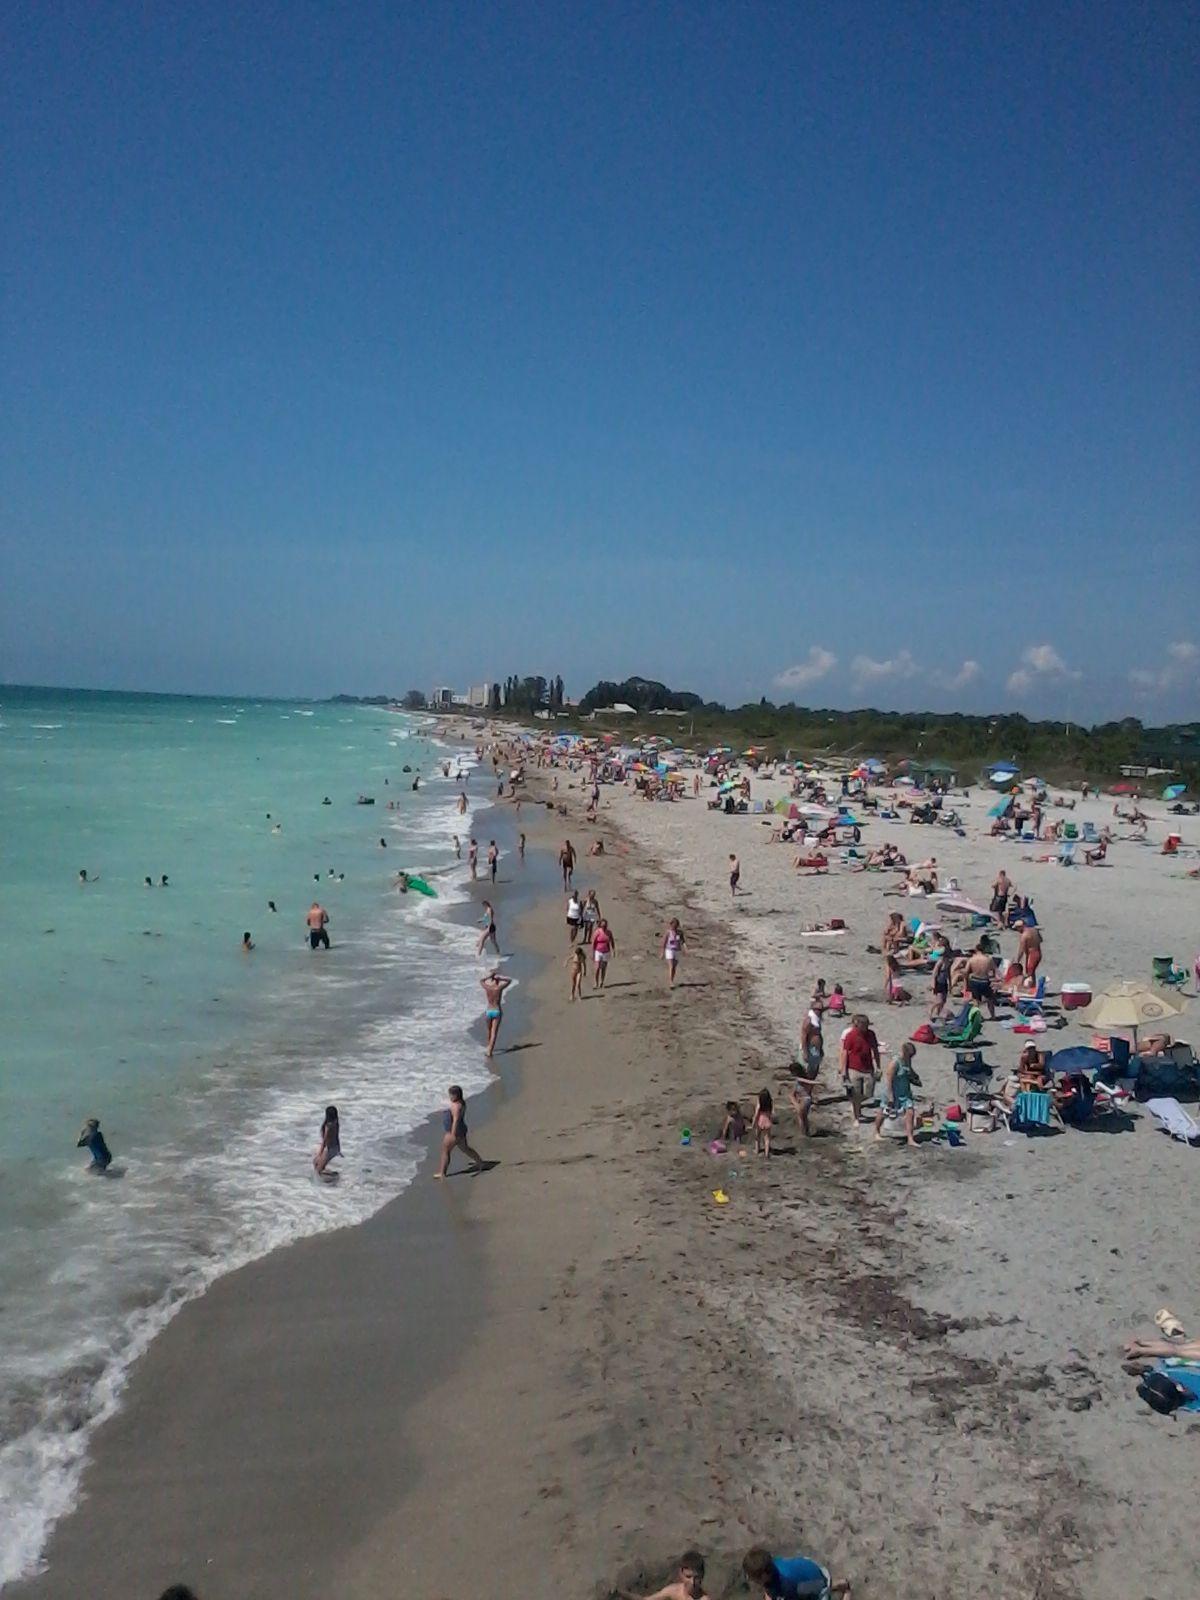 Beach florida venice Venice Beach,